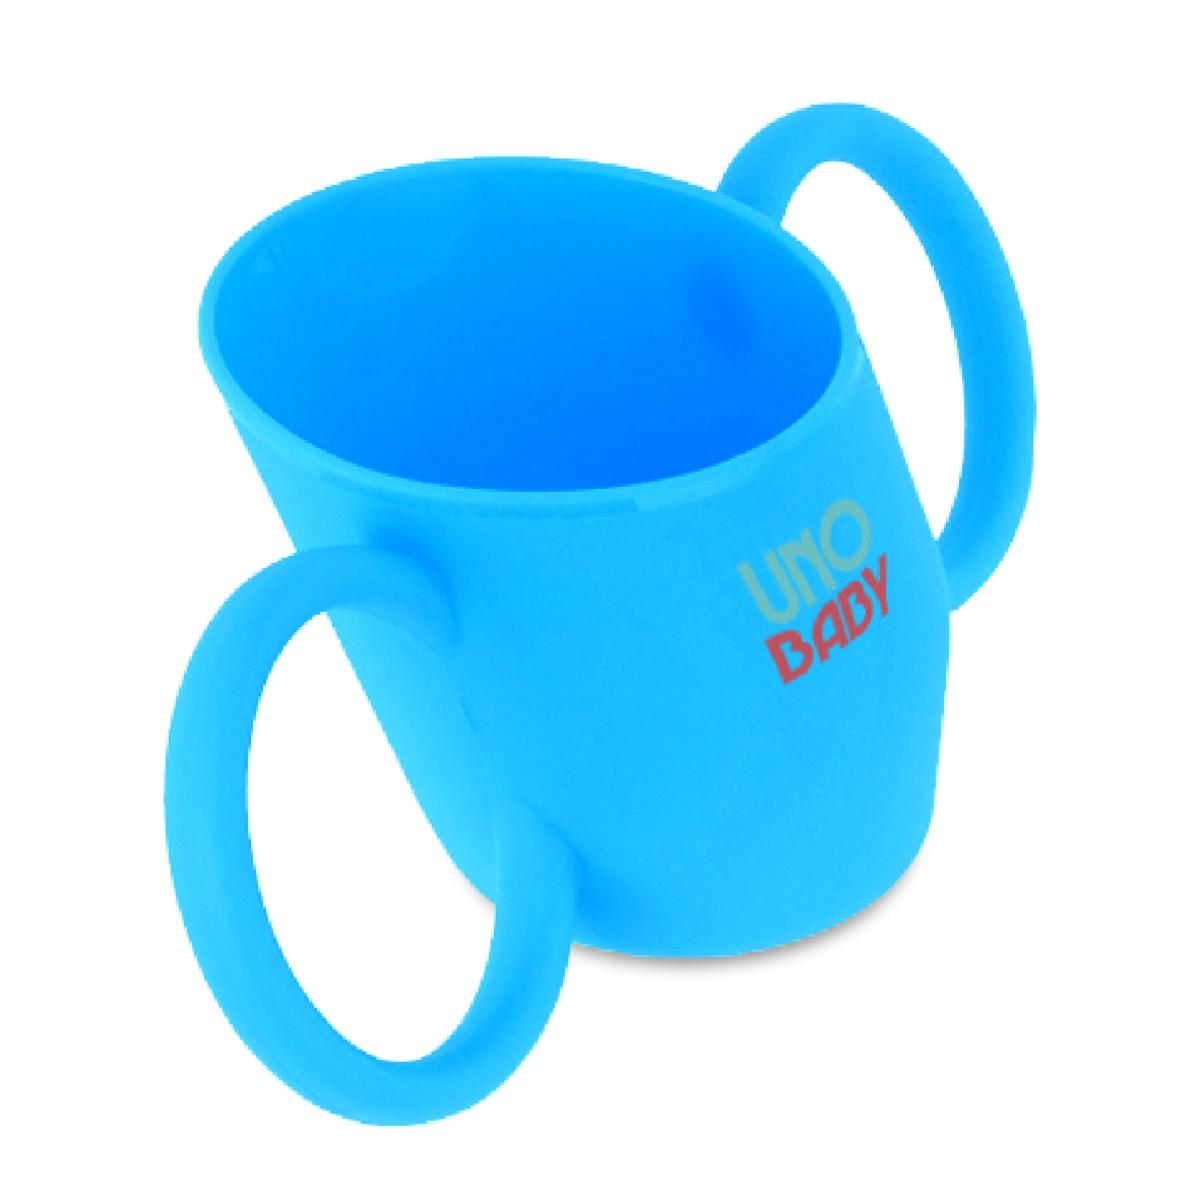 BT Cup 200ml